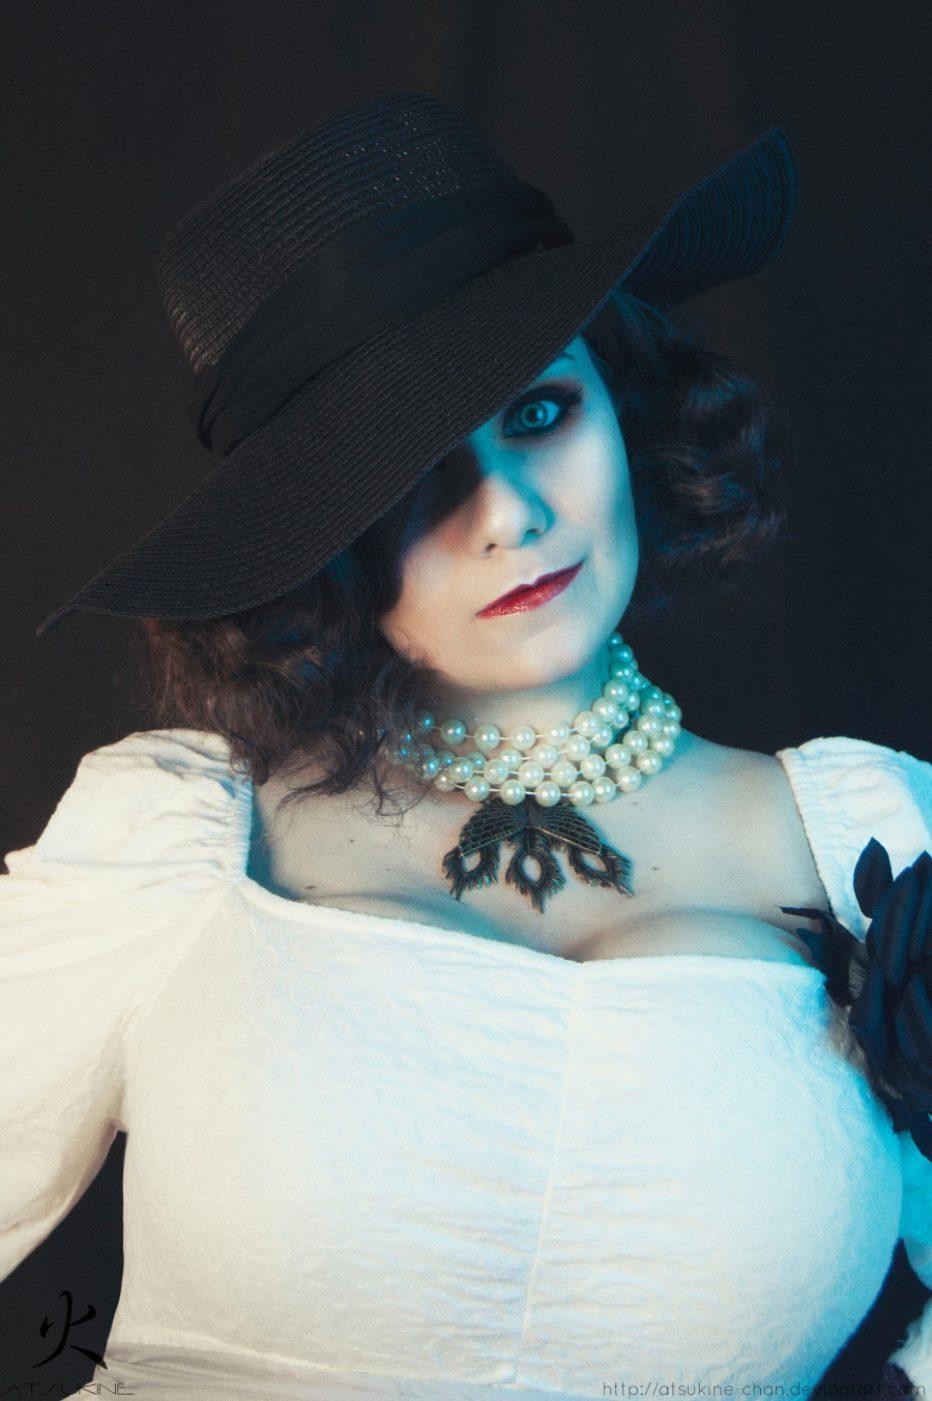 Resident-Evil-Village-Lady-Dimitrescu-Cosplay-Gamers-Heroes-2.jpg